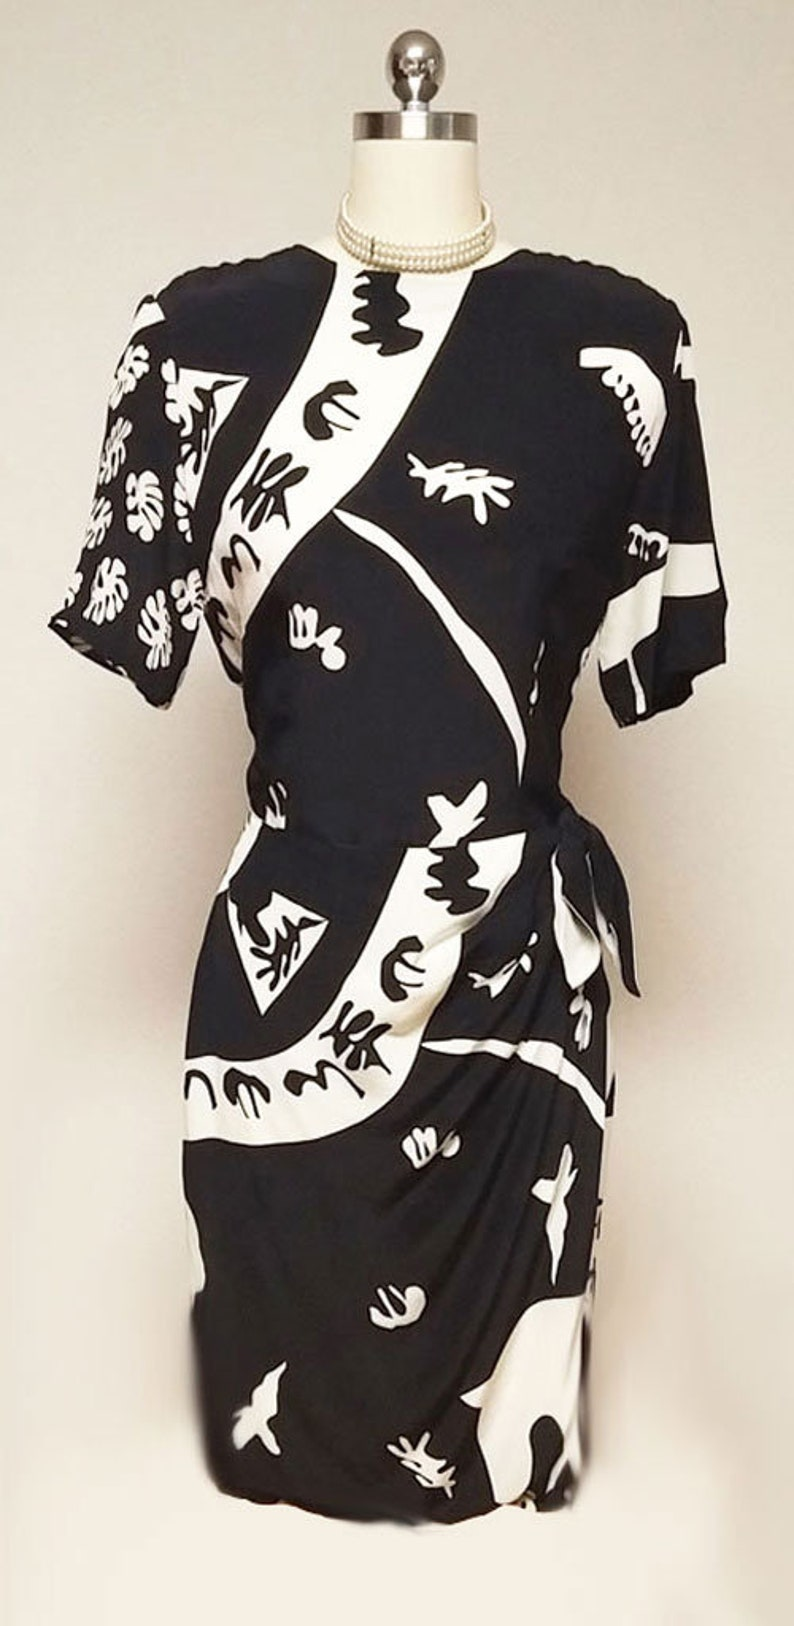 SALE Vintage 80s Nora Noh Silk Dress black and white dress 80s dress designer dress summer dress sarong dress vintage dress party dress blac